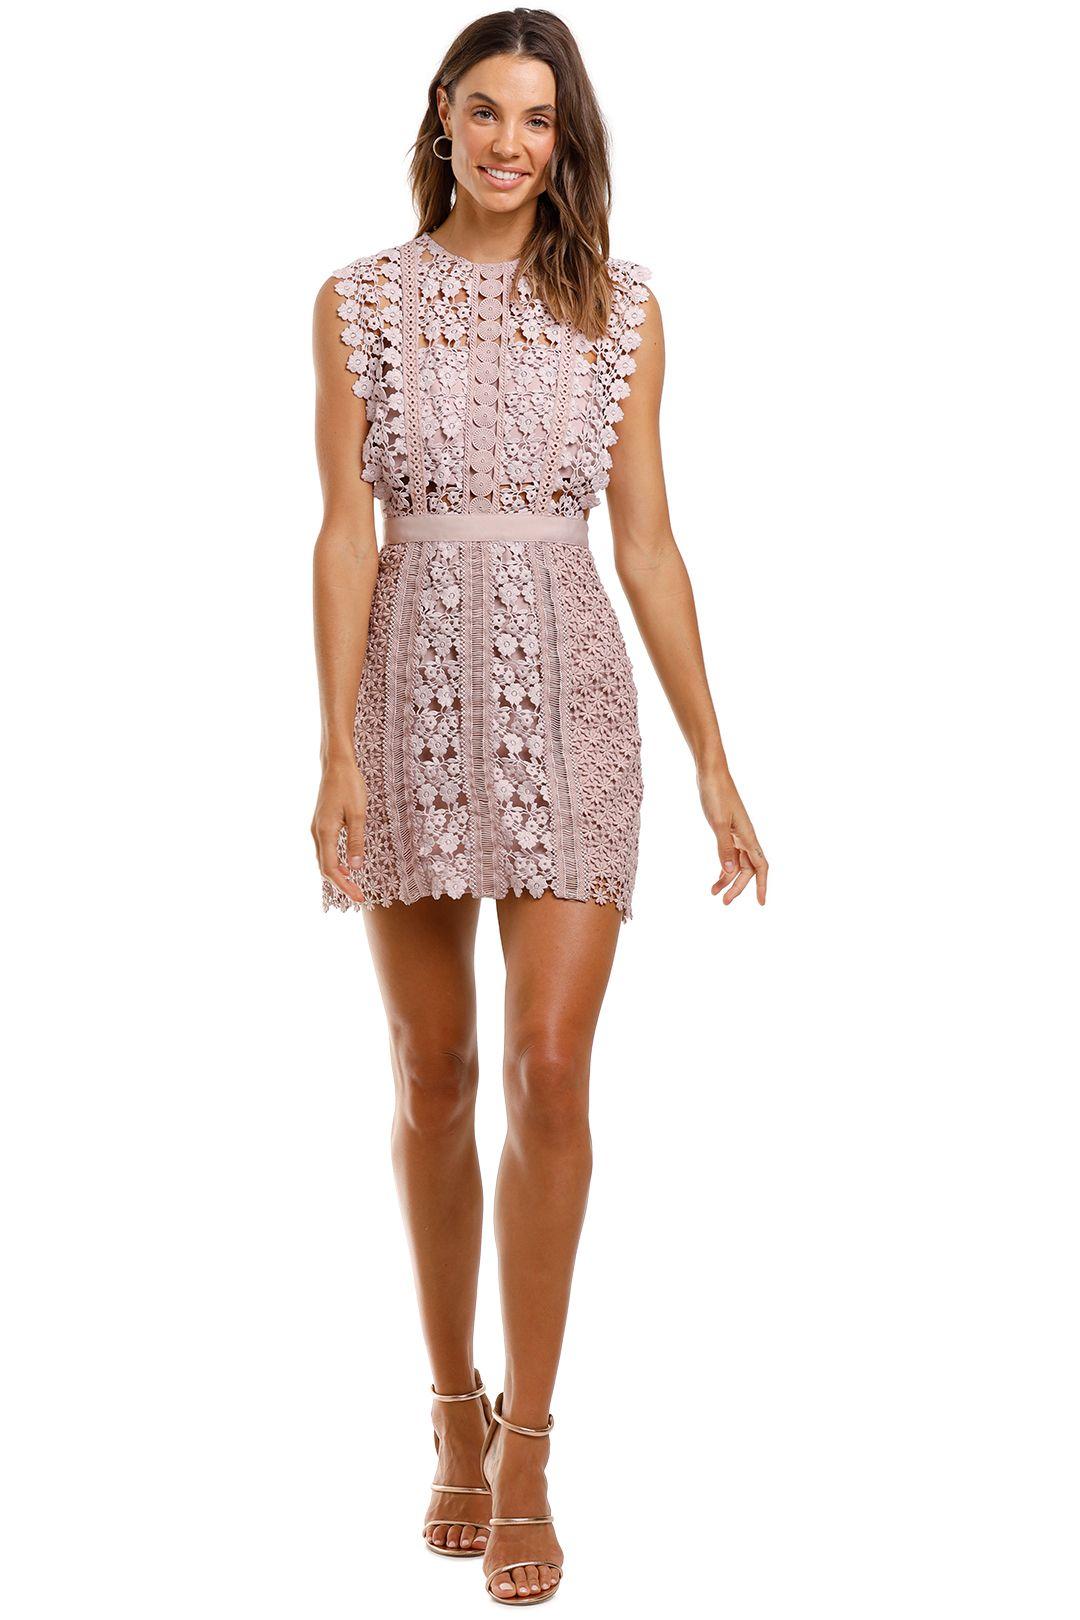 Self Portrait Daisy Vine Mini Dress Pink